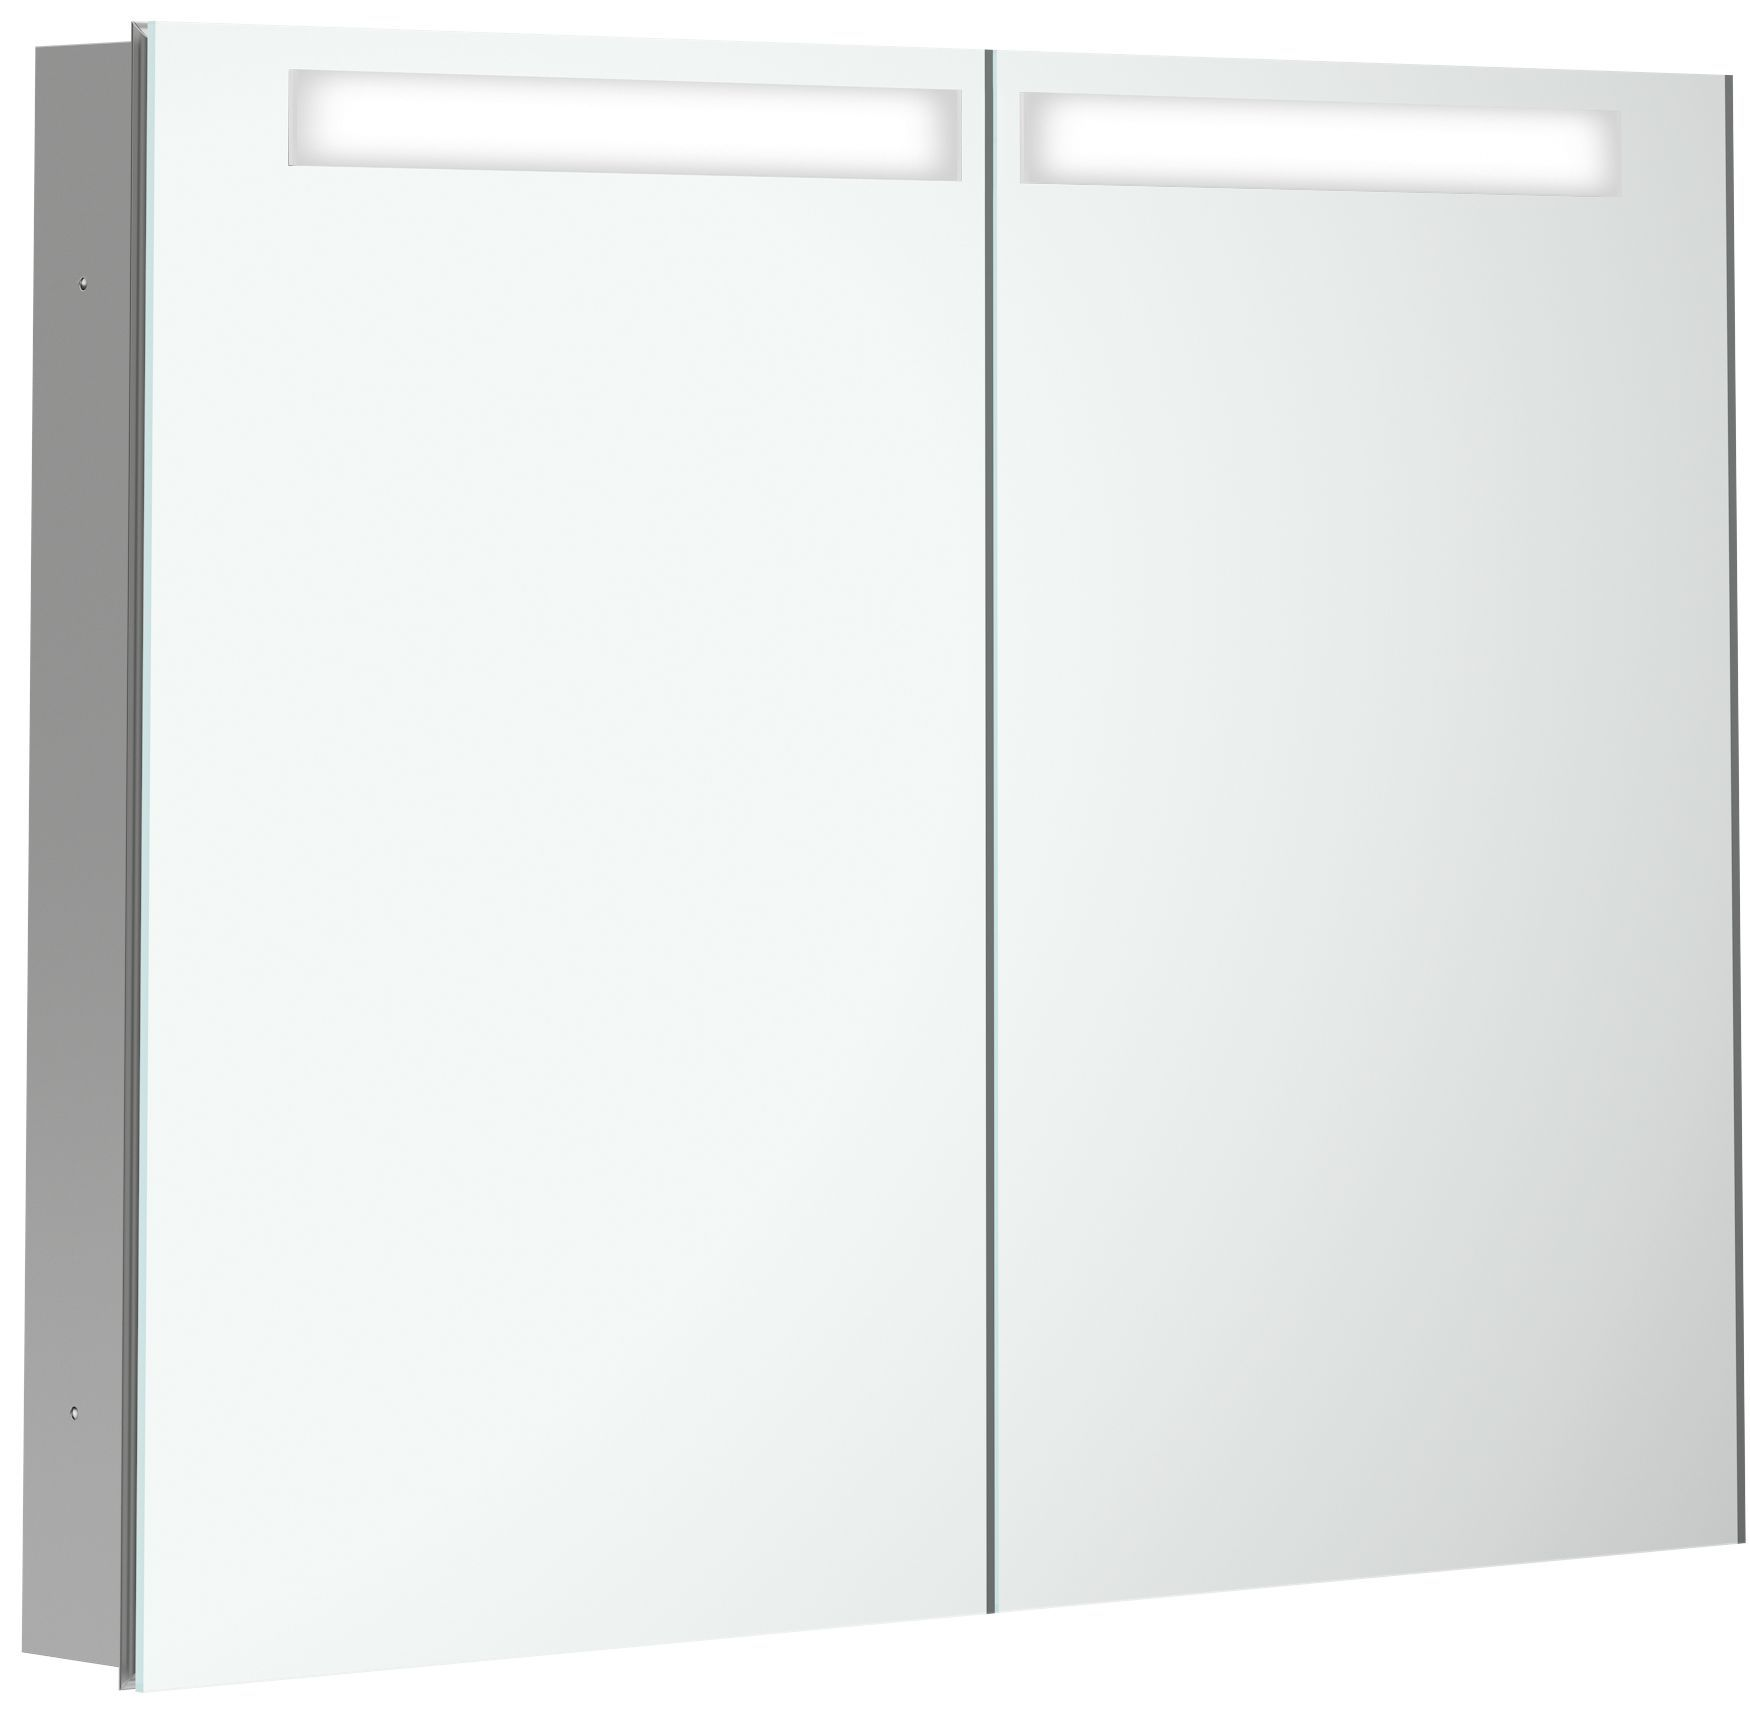 Villeroy & Boch My View In Spiegelschrank mit LED Beleuchtung B:100,1xH:74,7xT:10,7cm A4351000